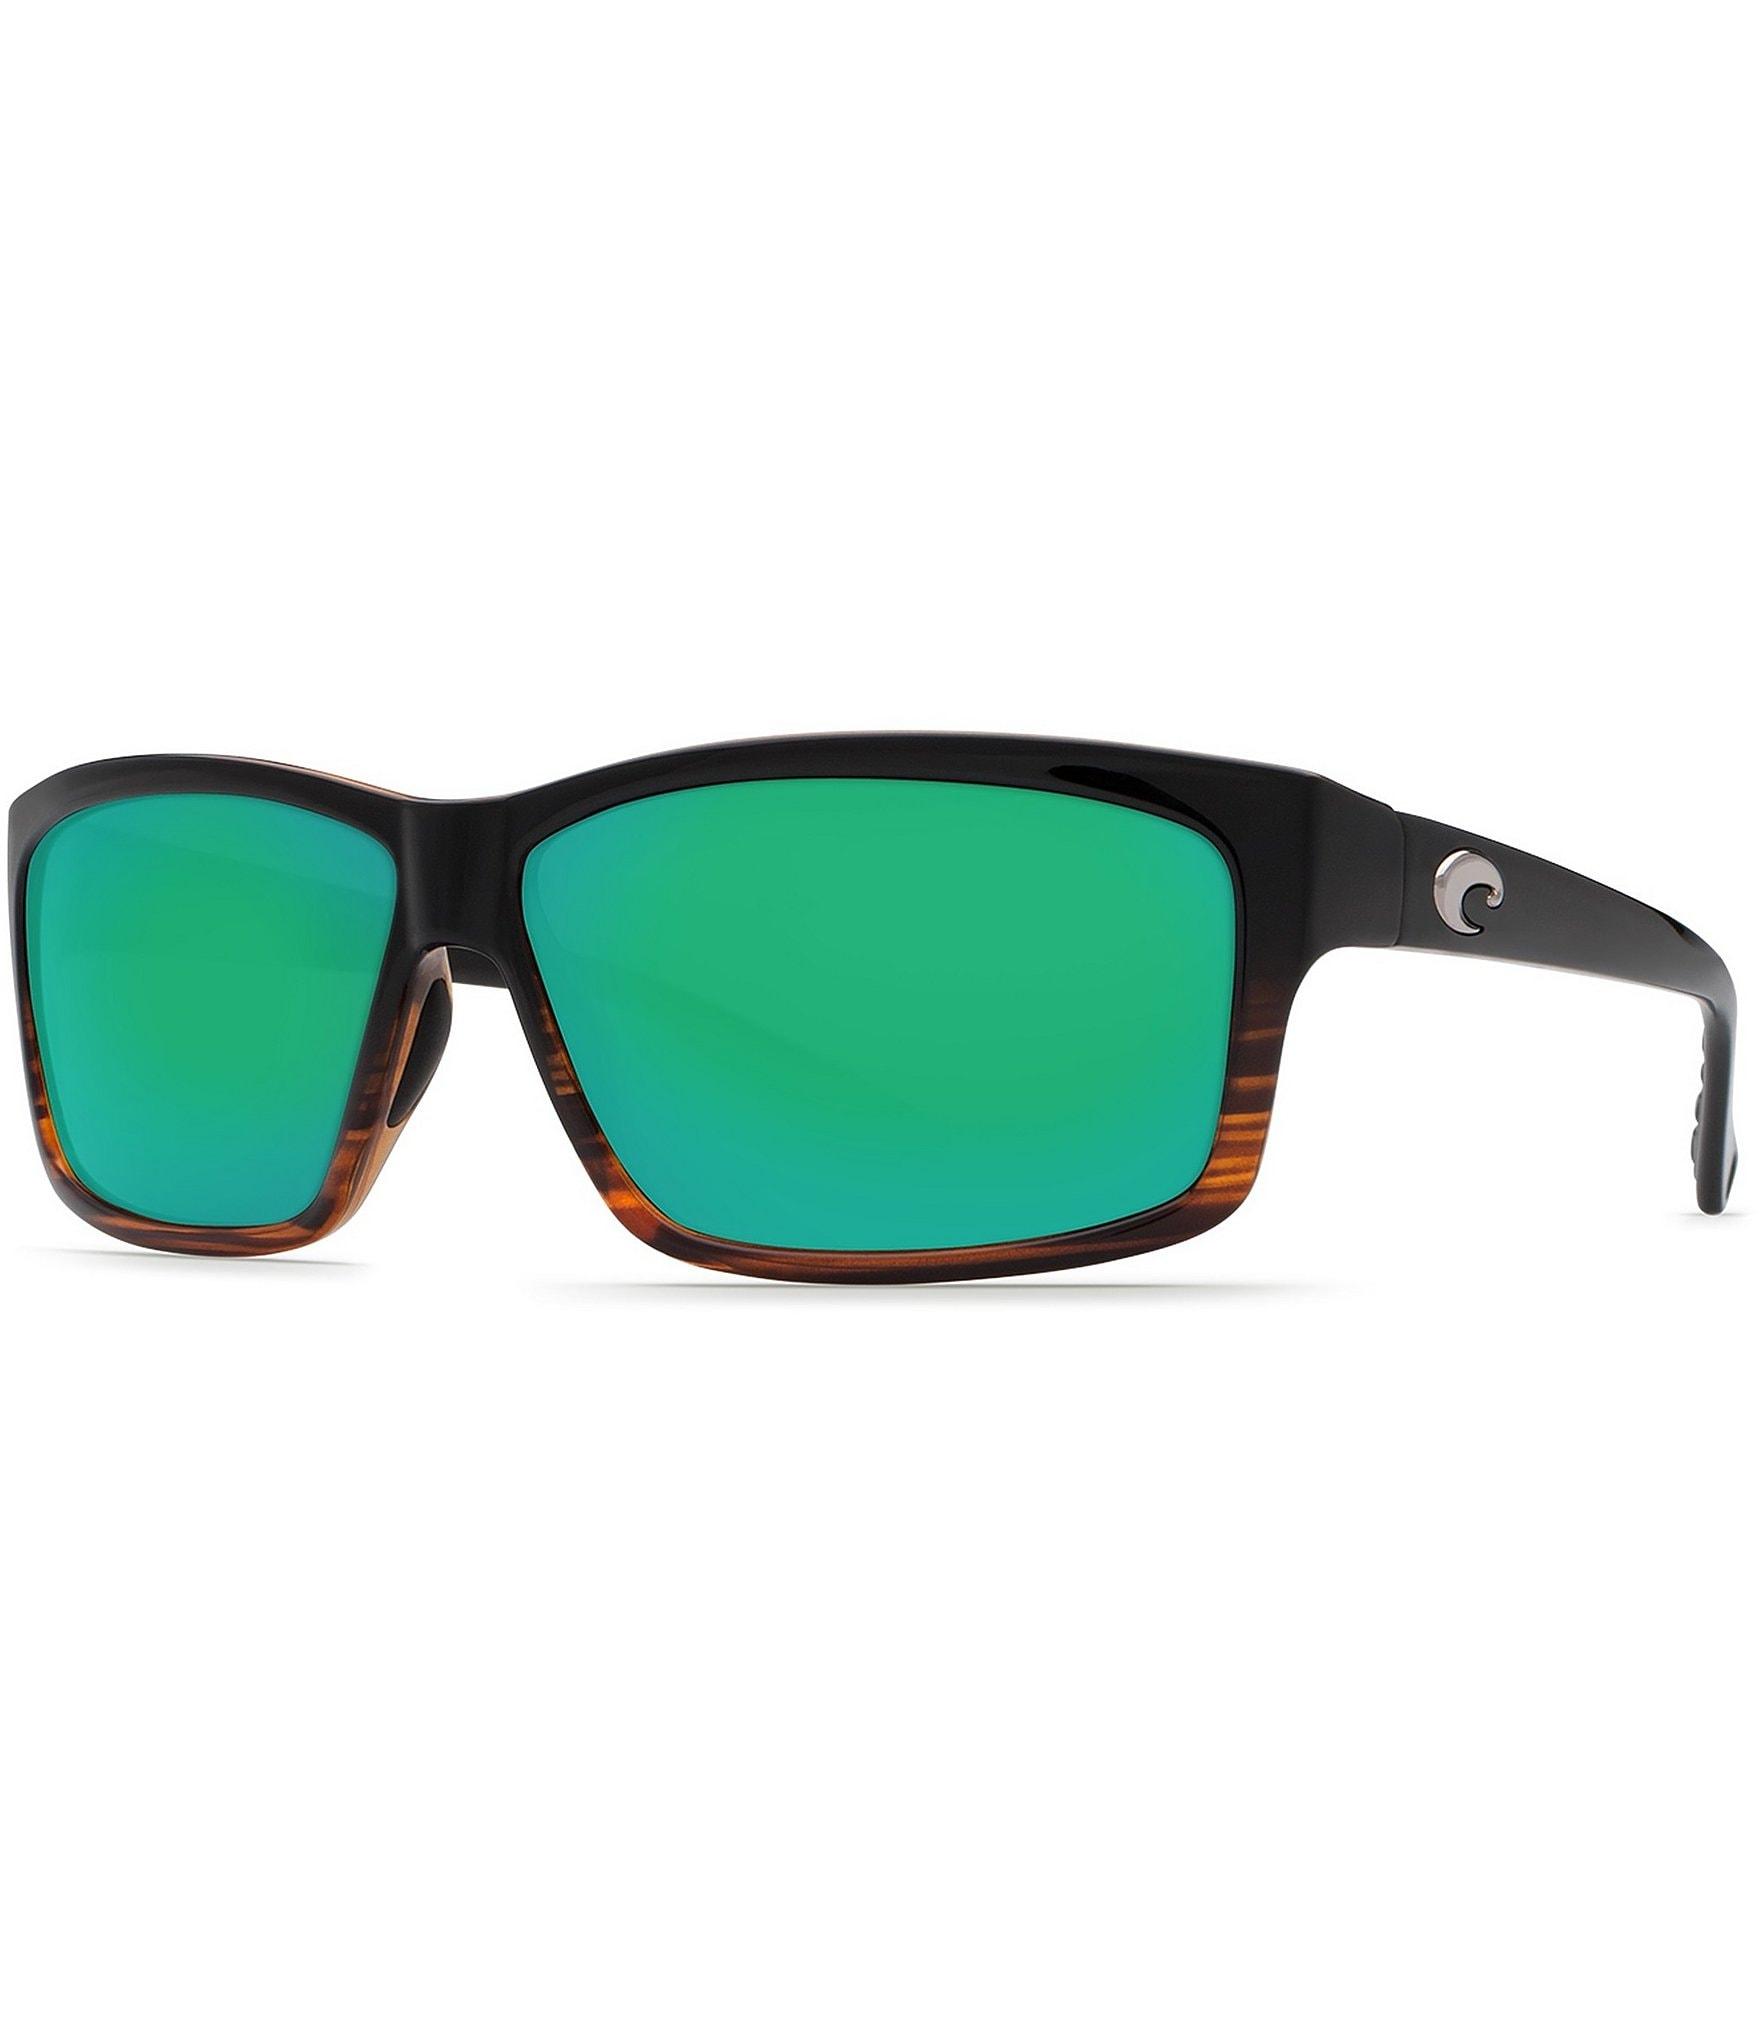 85fc643764 Costa Cut Polarized Sunglasses